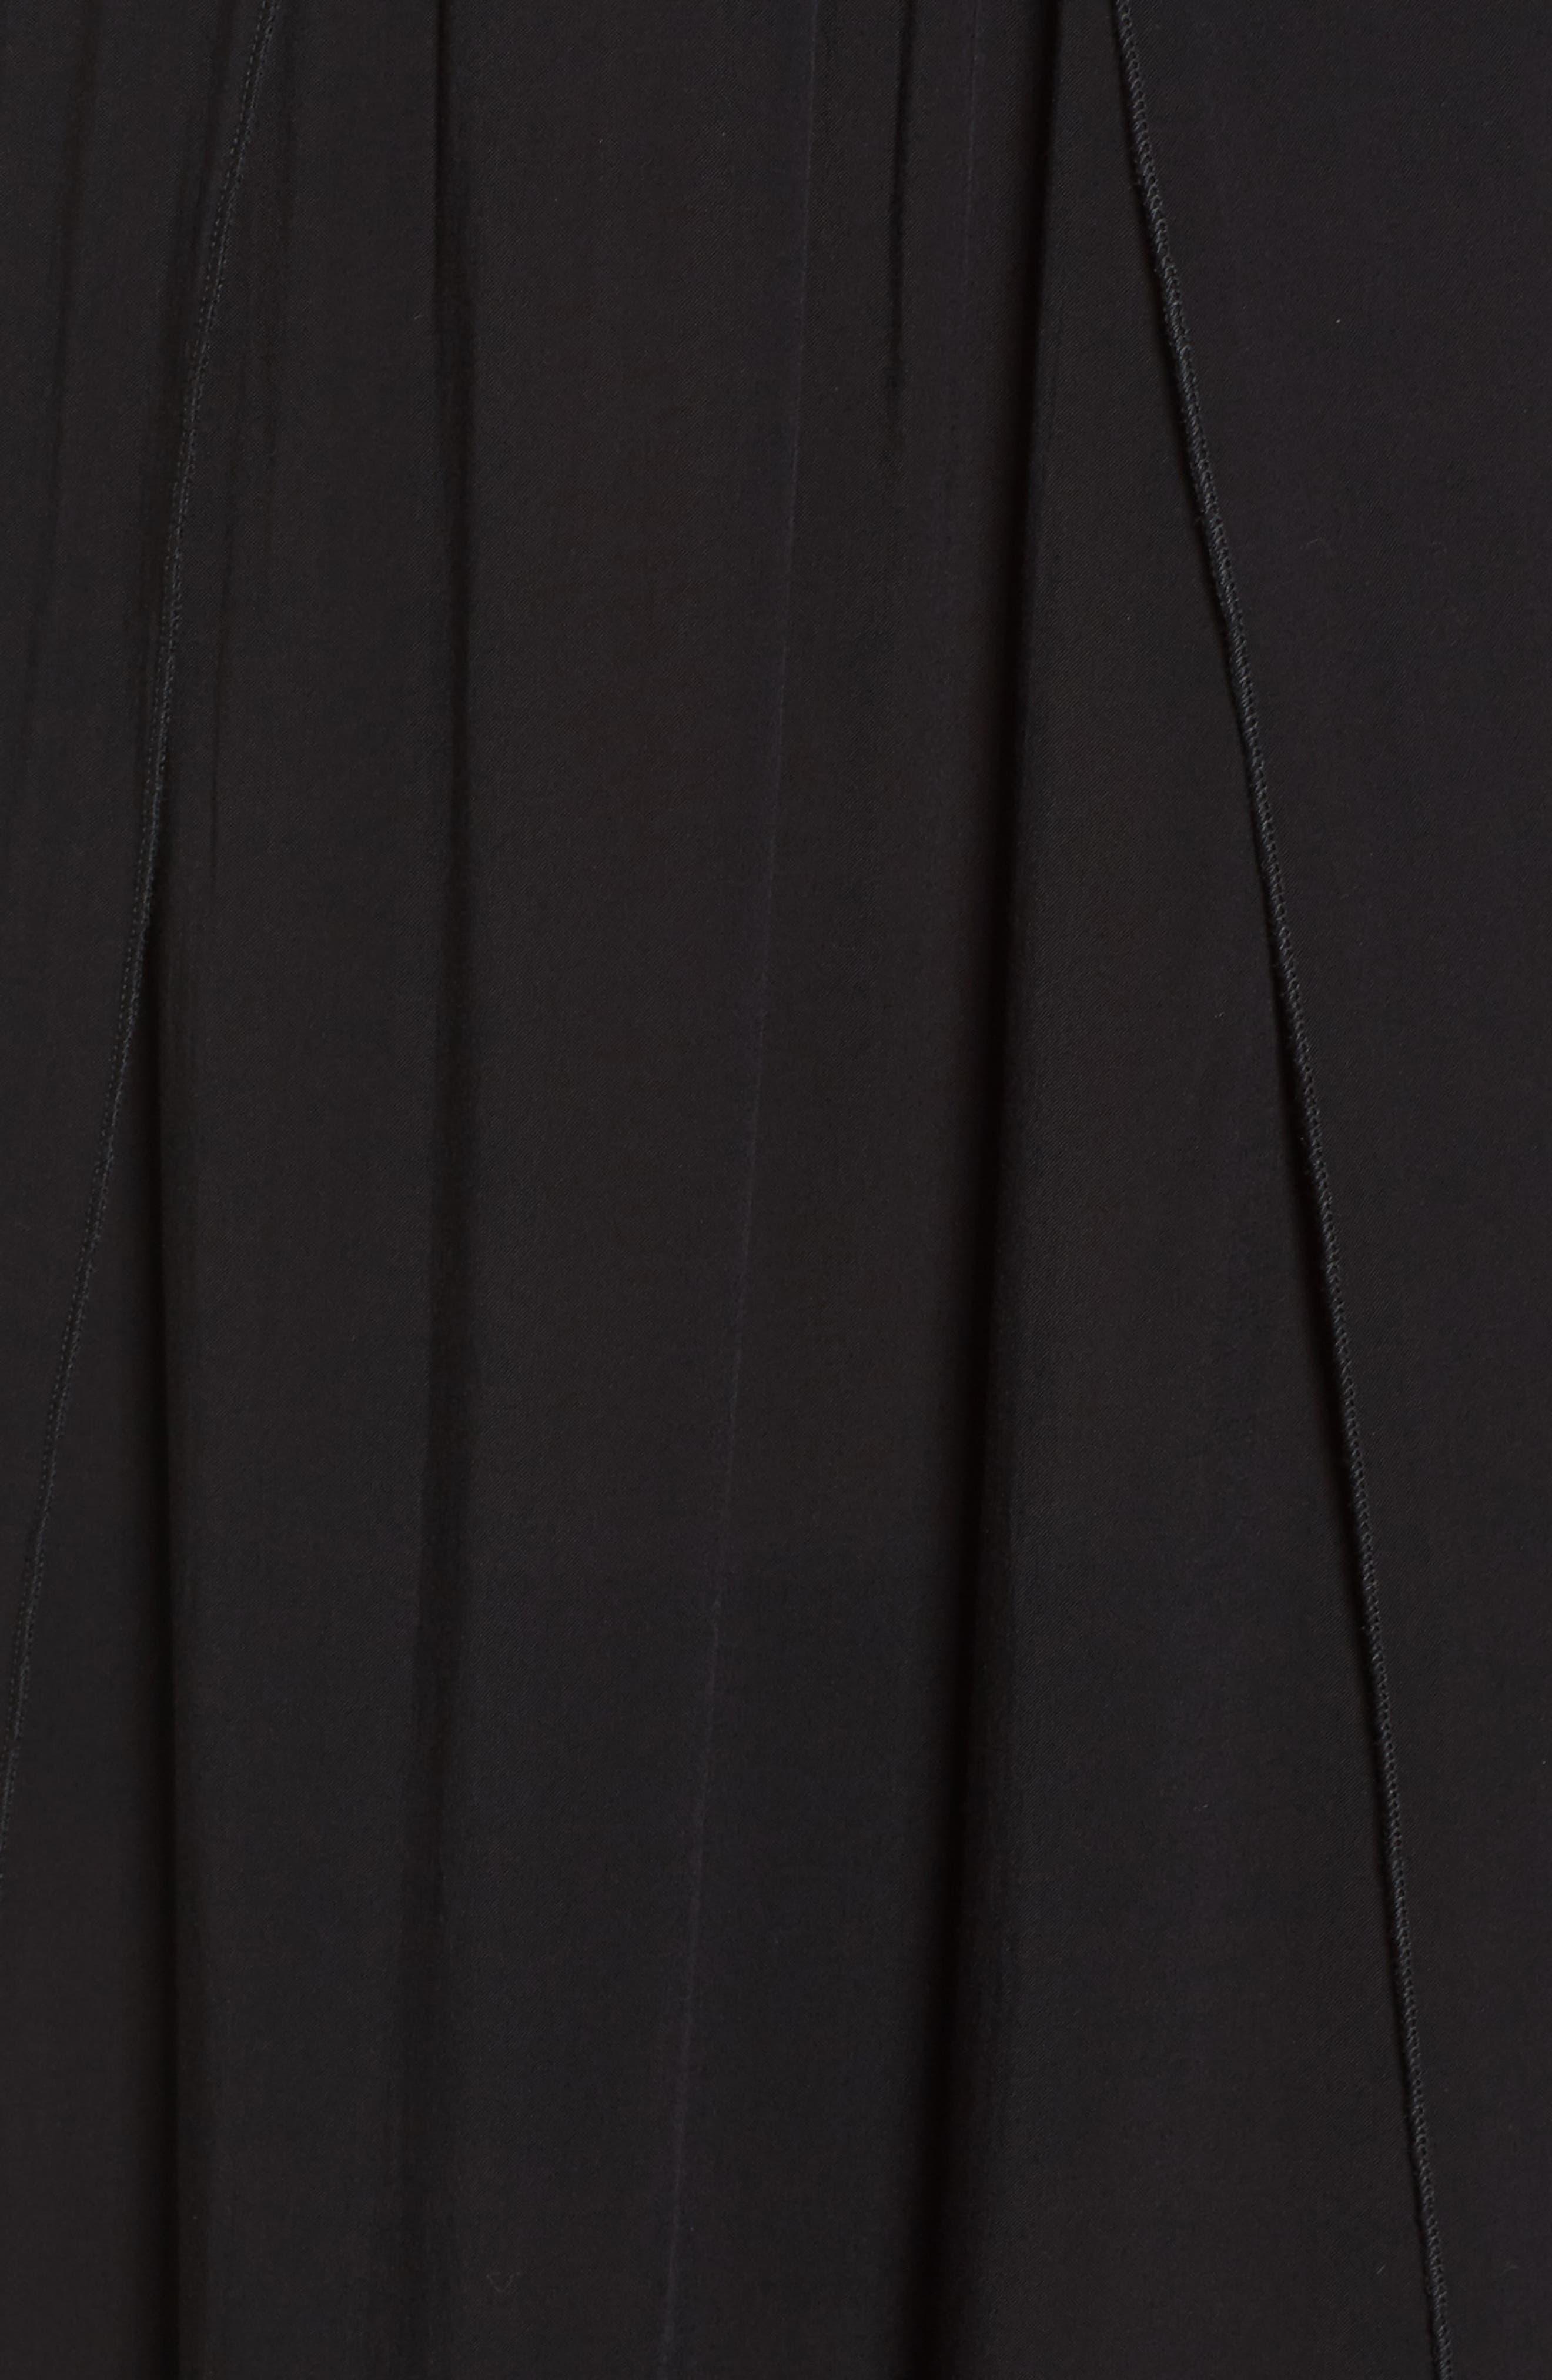 Strapless Maxi Cover-Up Dress,                             Alternate thumbnail 5, color,                             Black